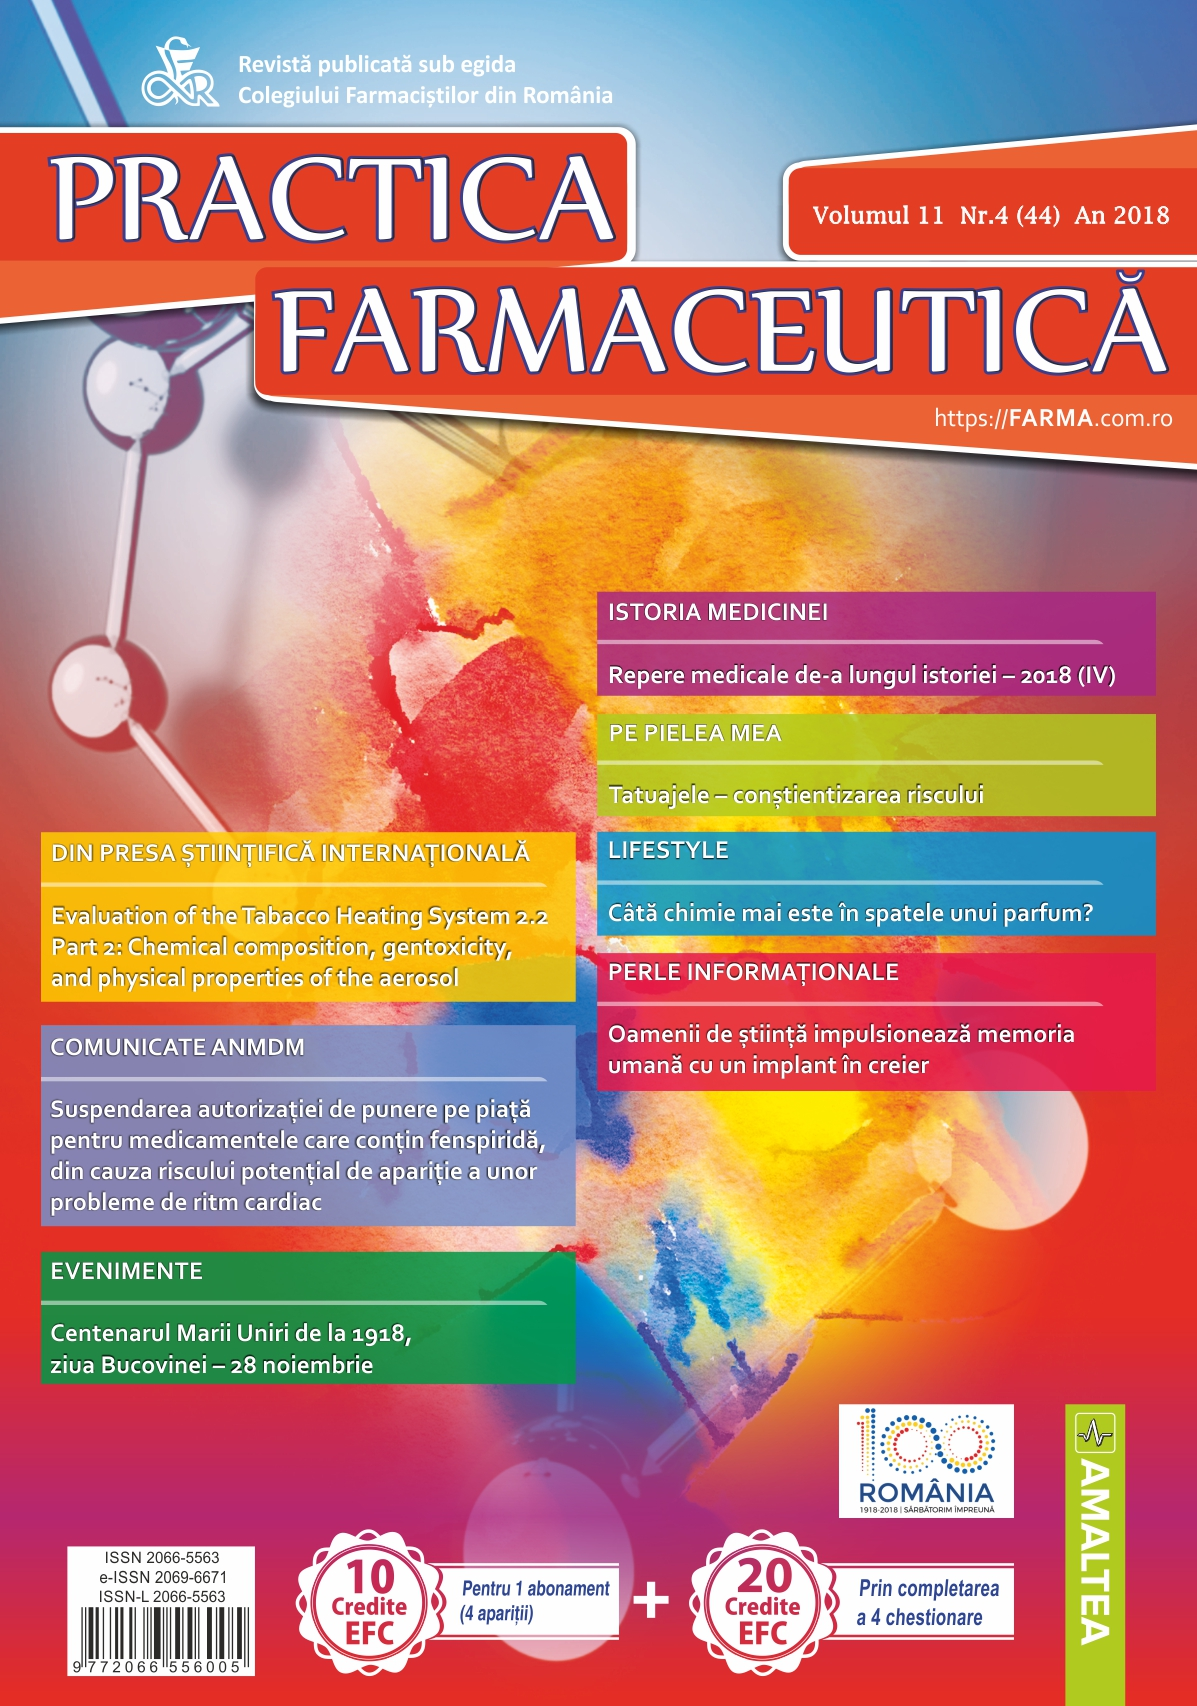 Revista Practica Farmaceutica, Vol. 11, Nr. 4 (44), 2018